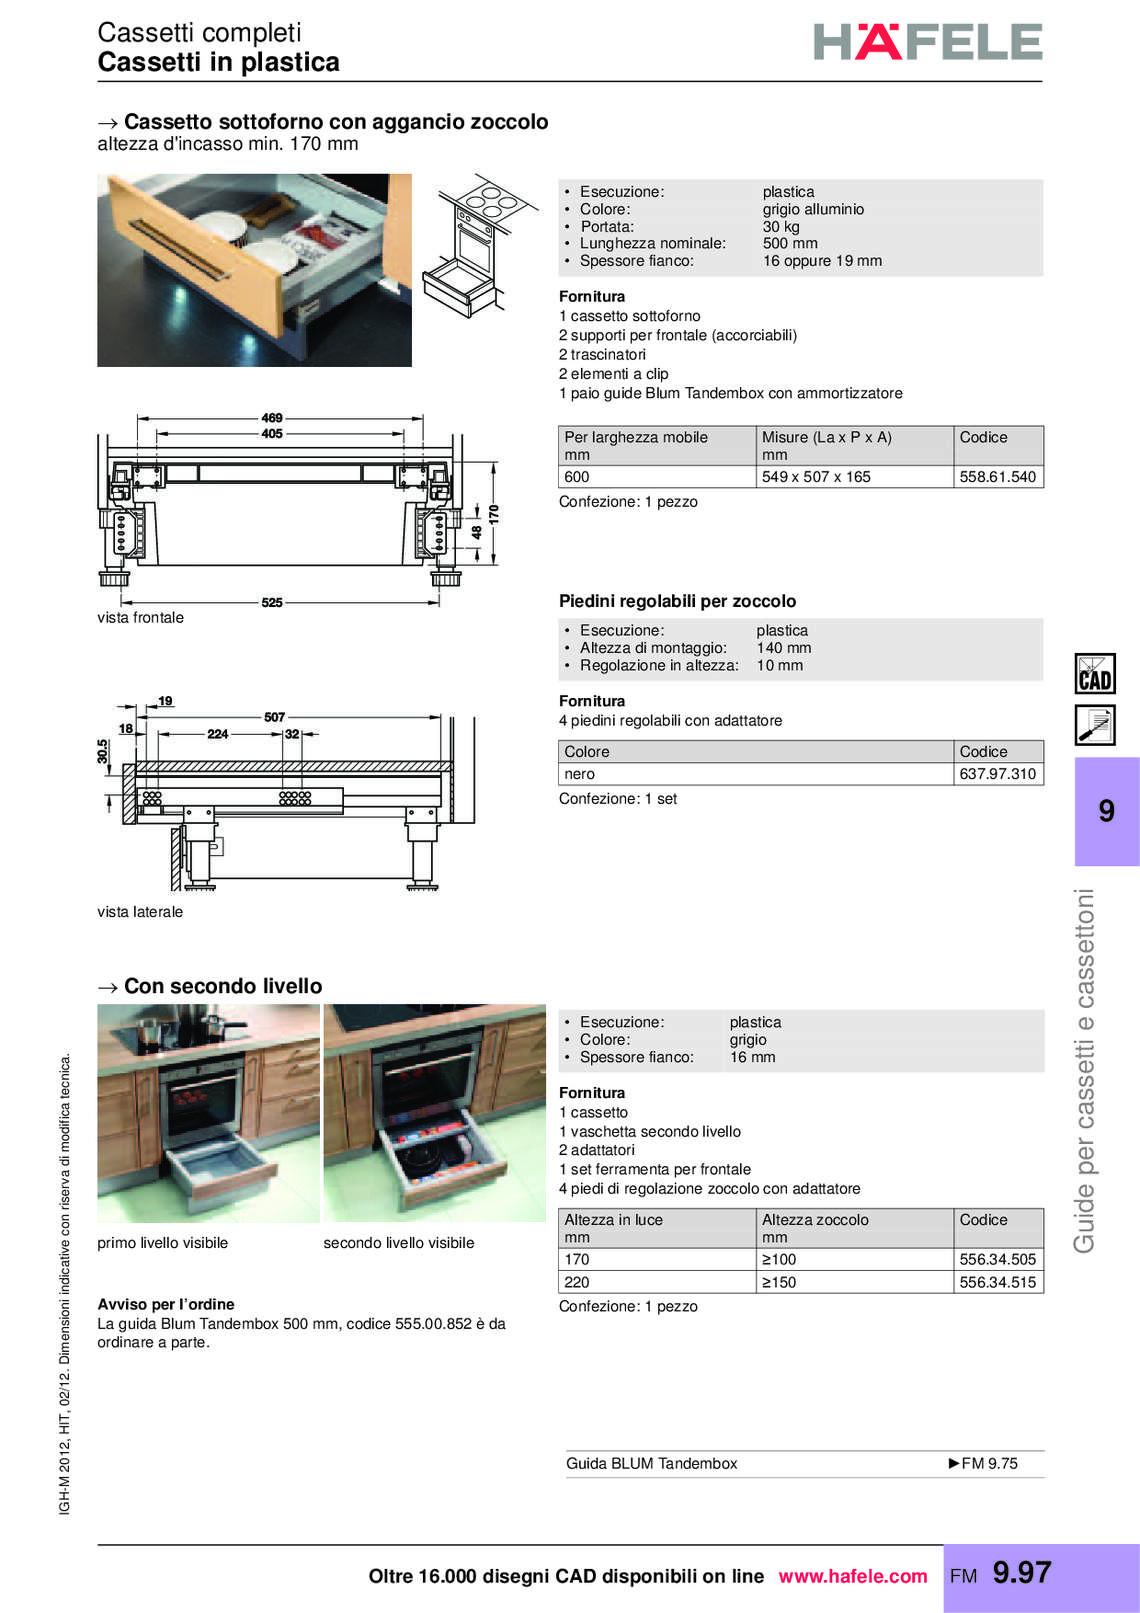 hafele-spondine-e-guide-per-mobili_40_144.jpg